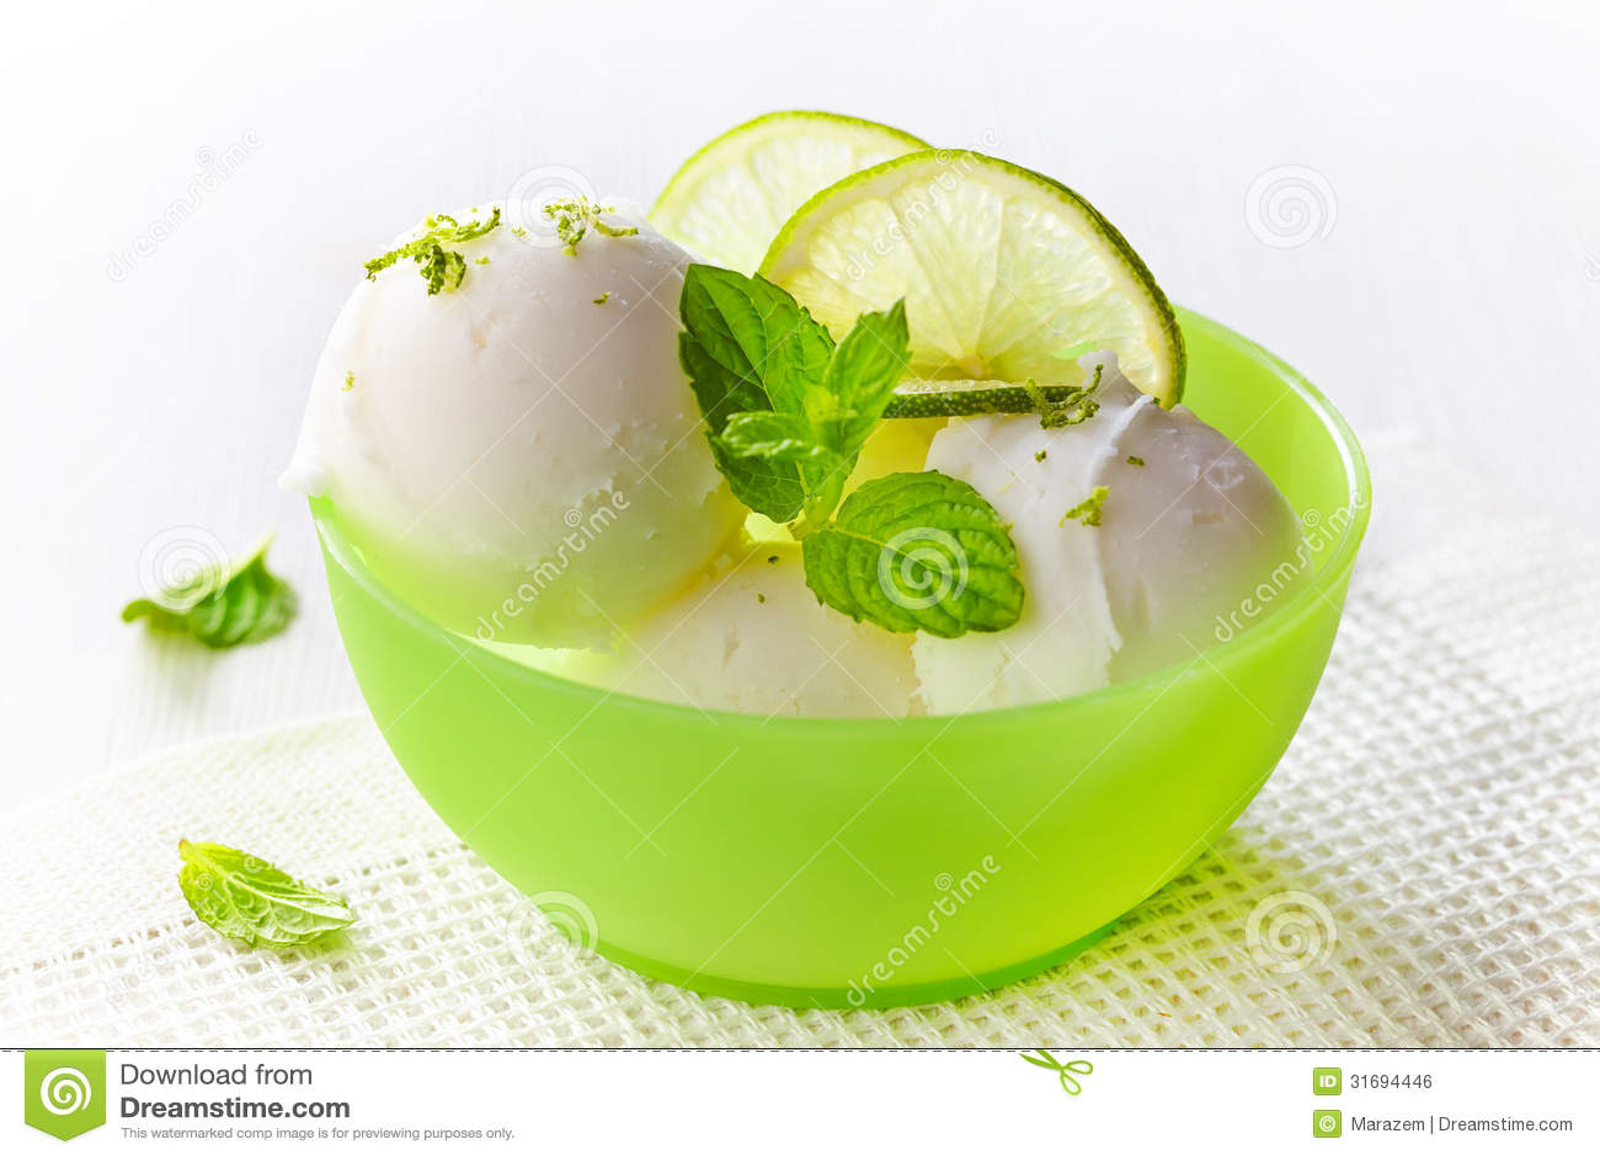 Lemon Sorbet Royalty Free Stock Image - Image: 31694446